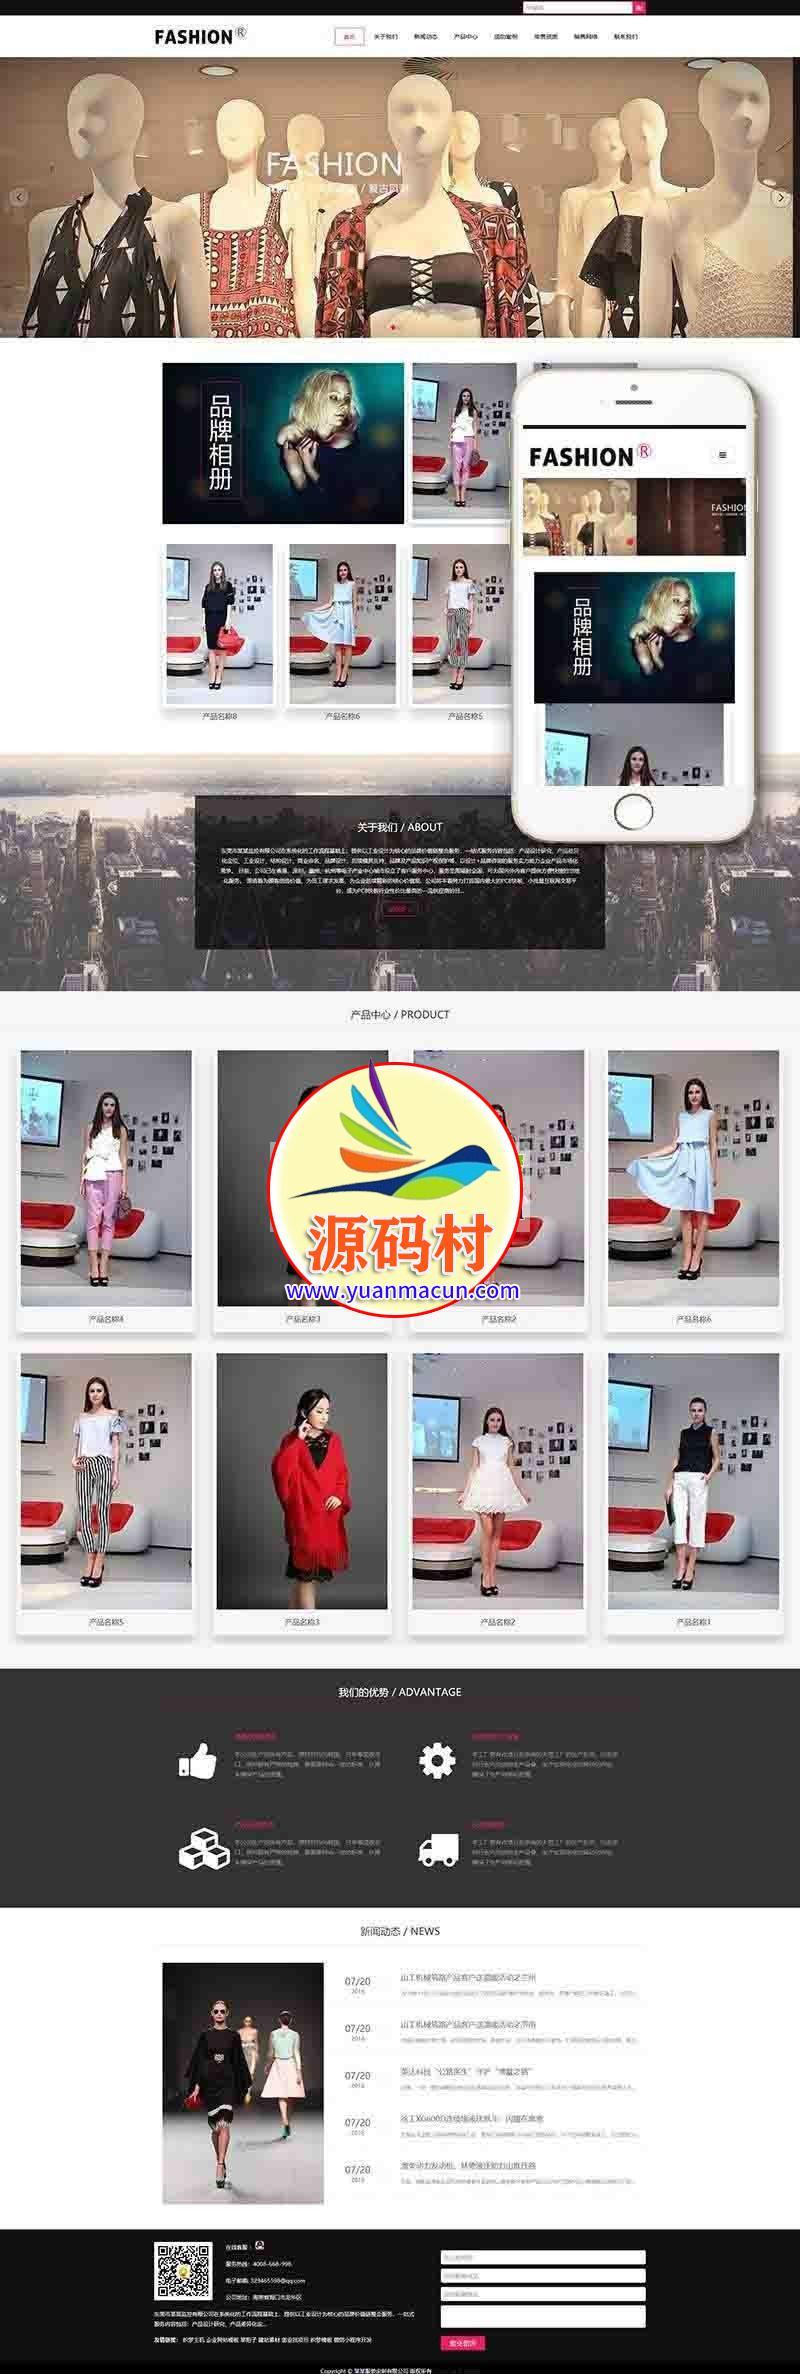 dedecms织梦响应式服装定制设计类网站源码(自适应手机端) 服装设计展示整站源码下载